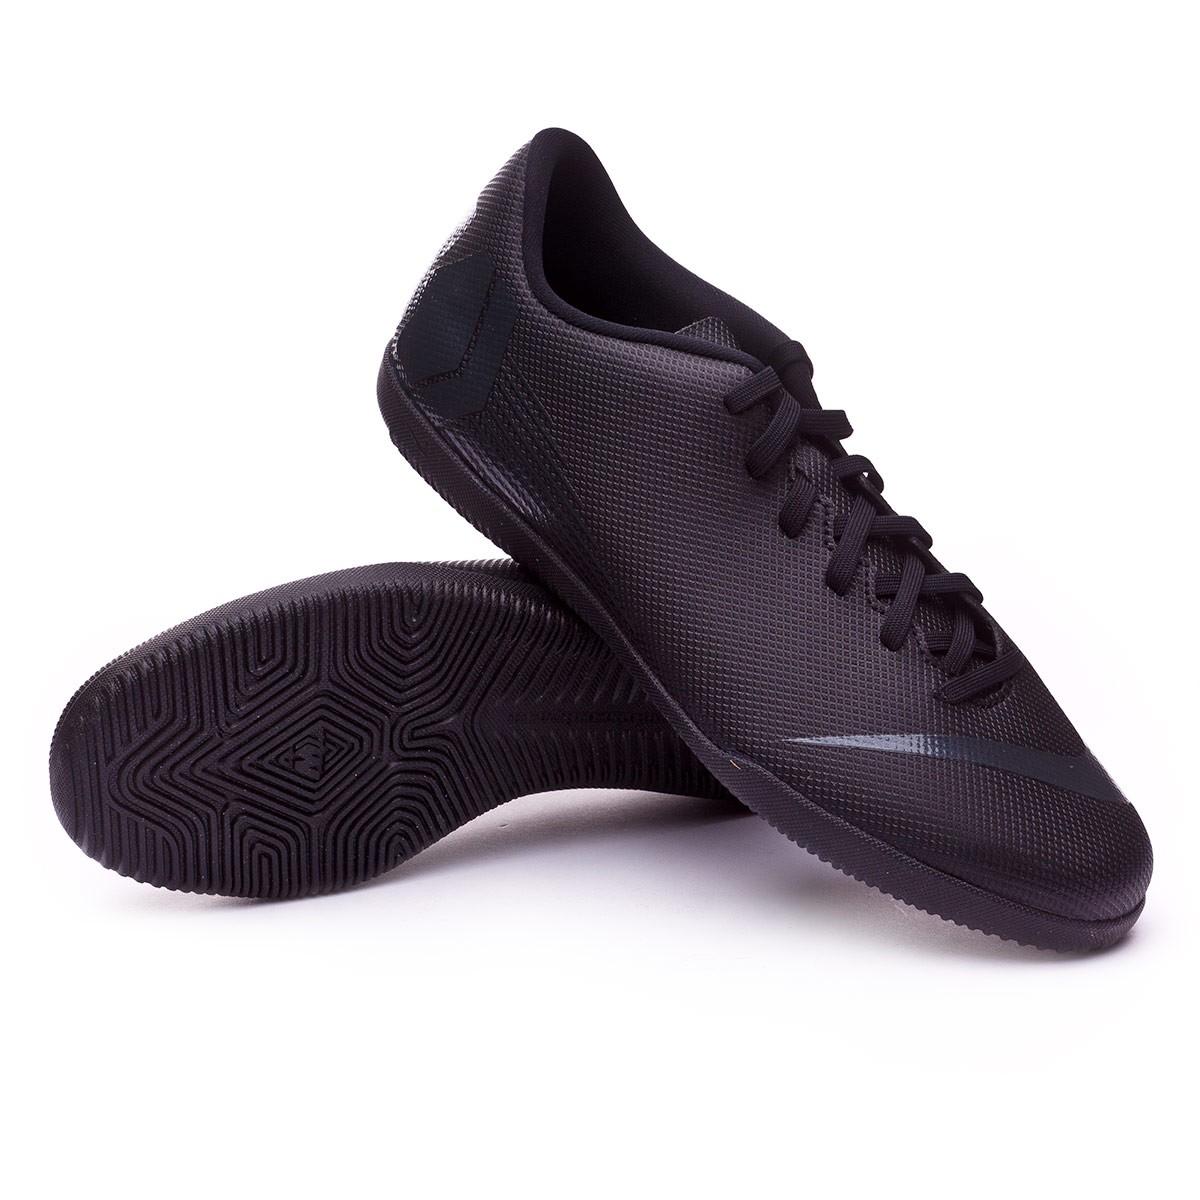 8c6253dabfaa Futsal Boot Nike Mercurial Vapor XII Club IC Black - Football store ...